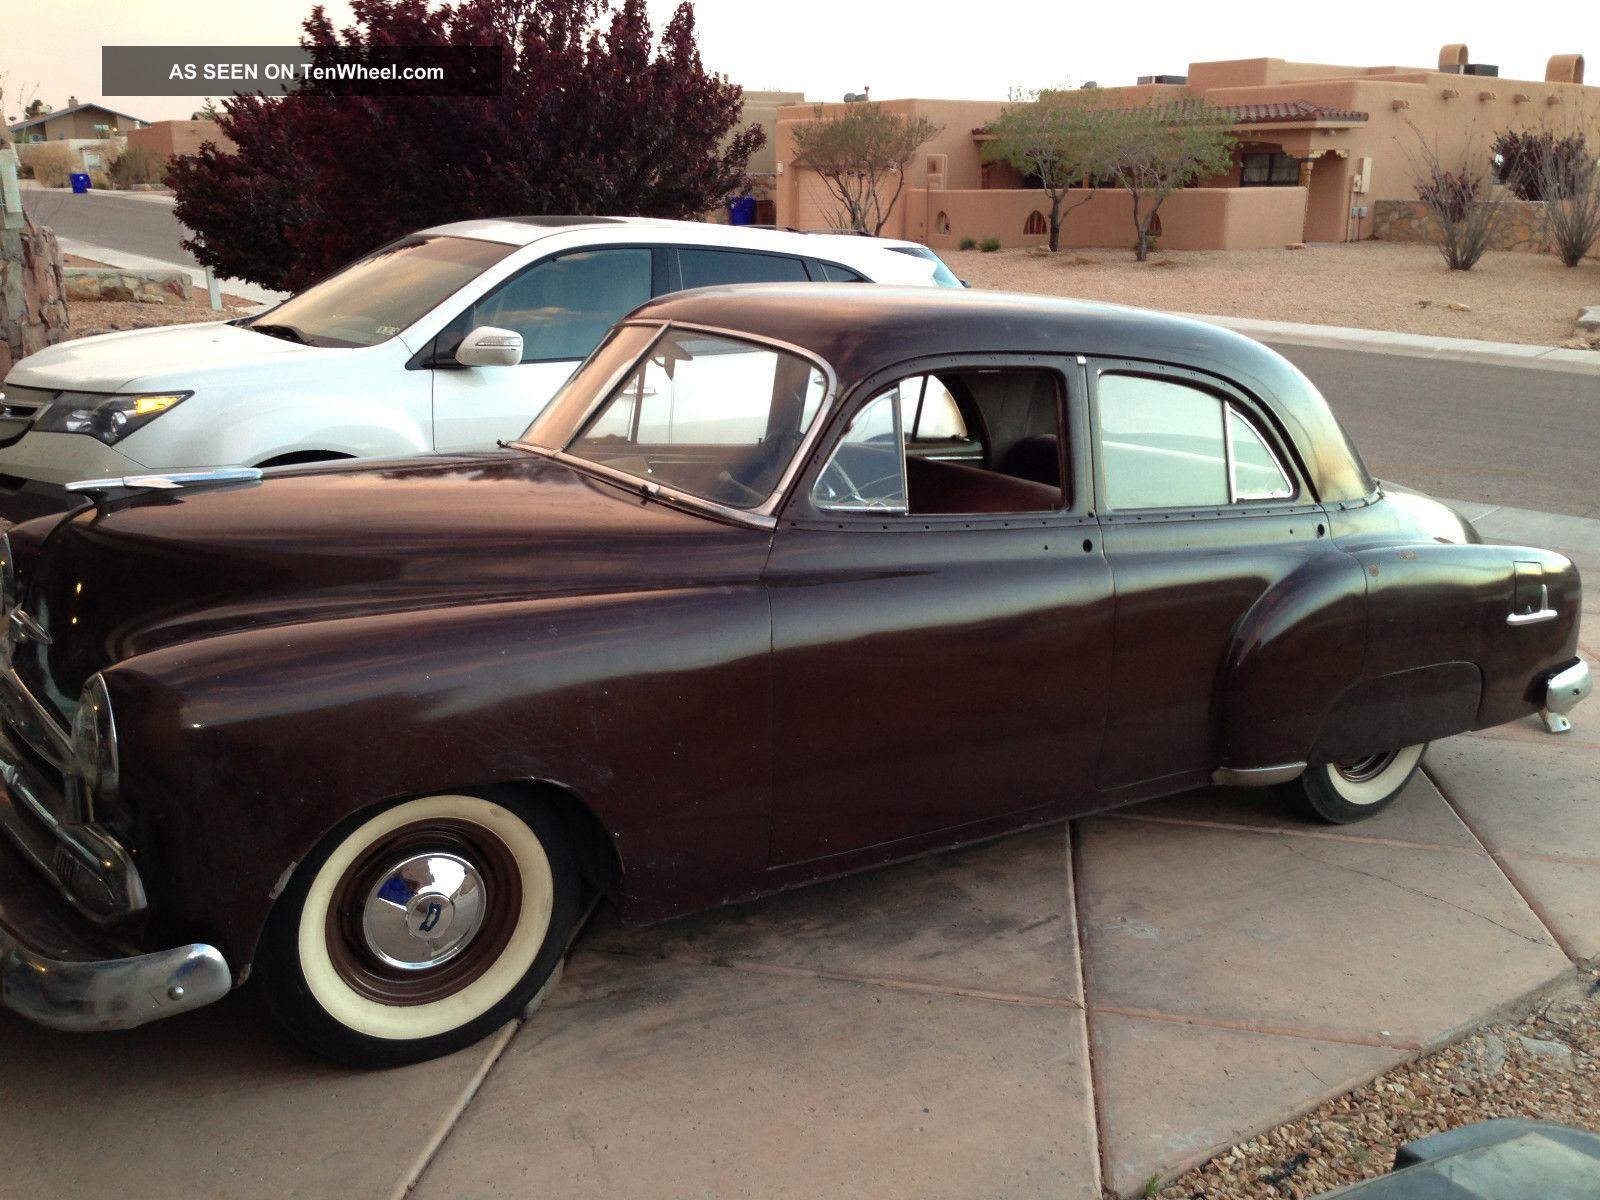 1951 Chevy Bel Air 150 210 Hot Rod Rat Kustom Classic Cadillac Lead Sled